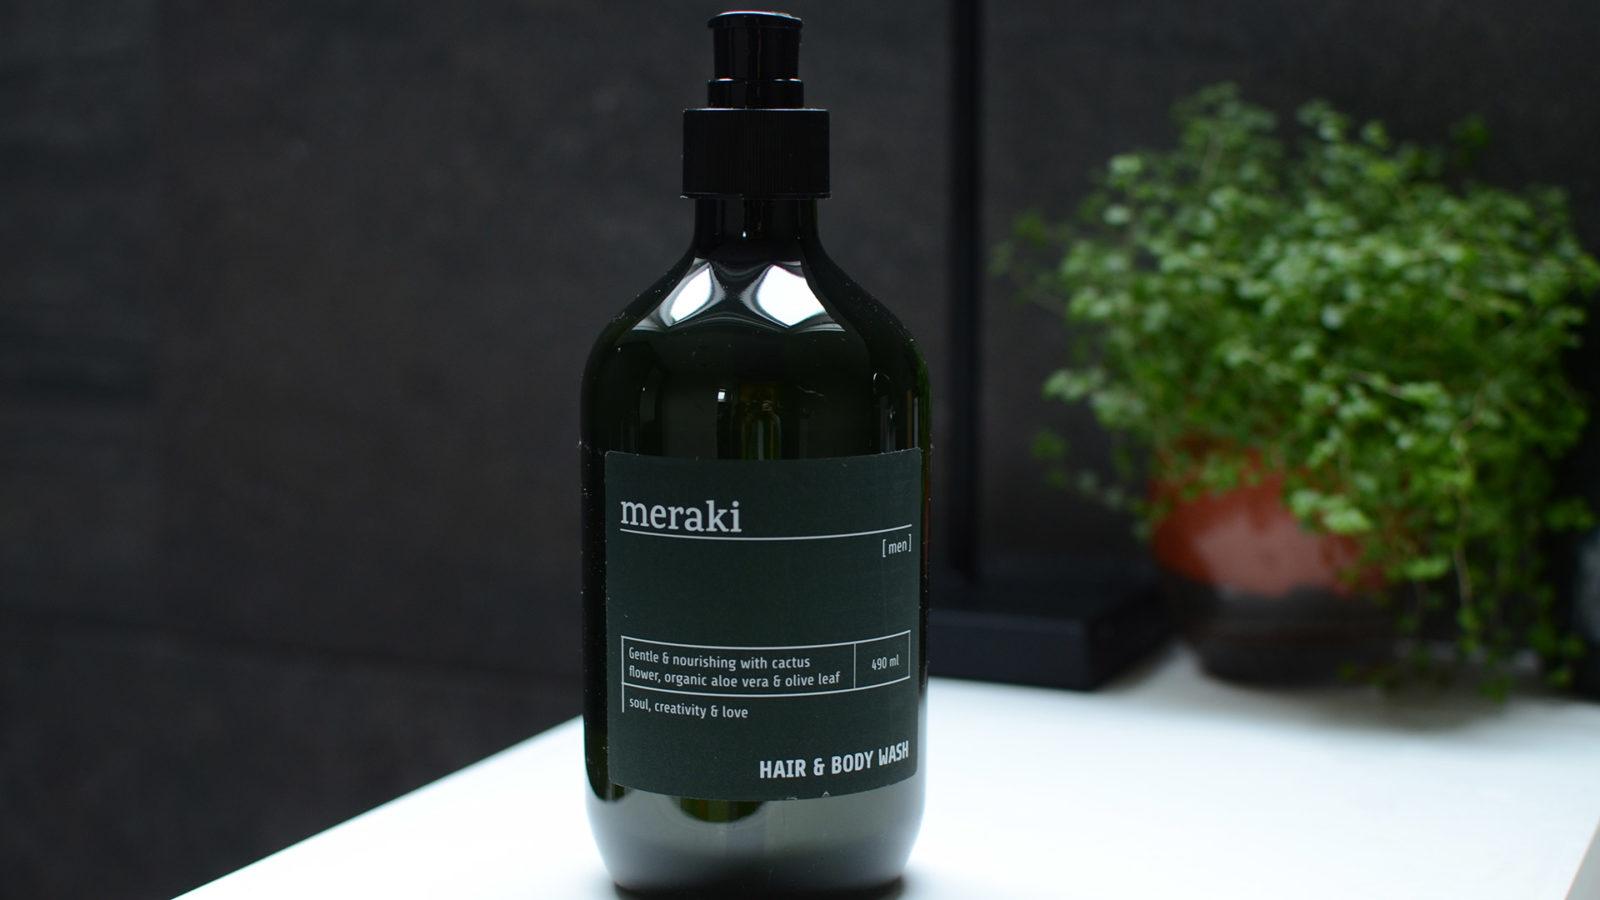 meraki-mens-hair-and-body-wash